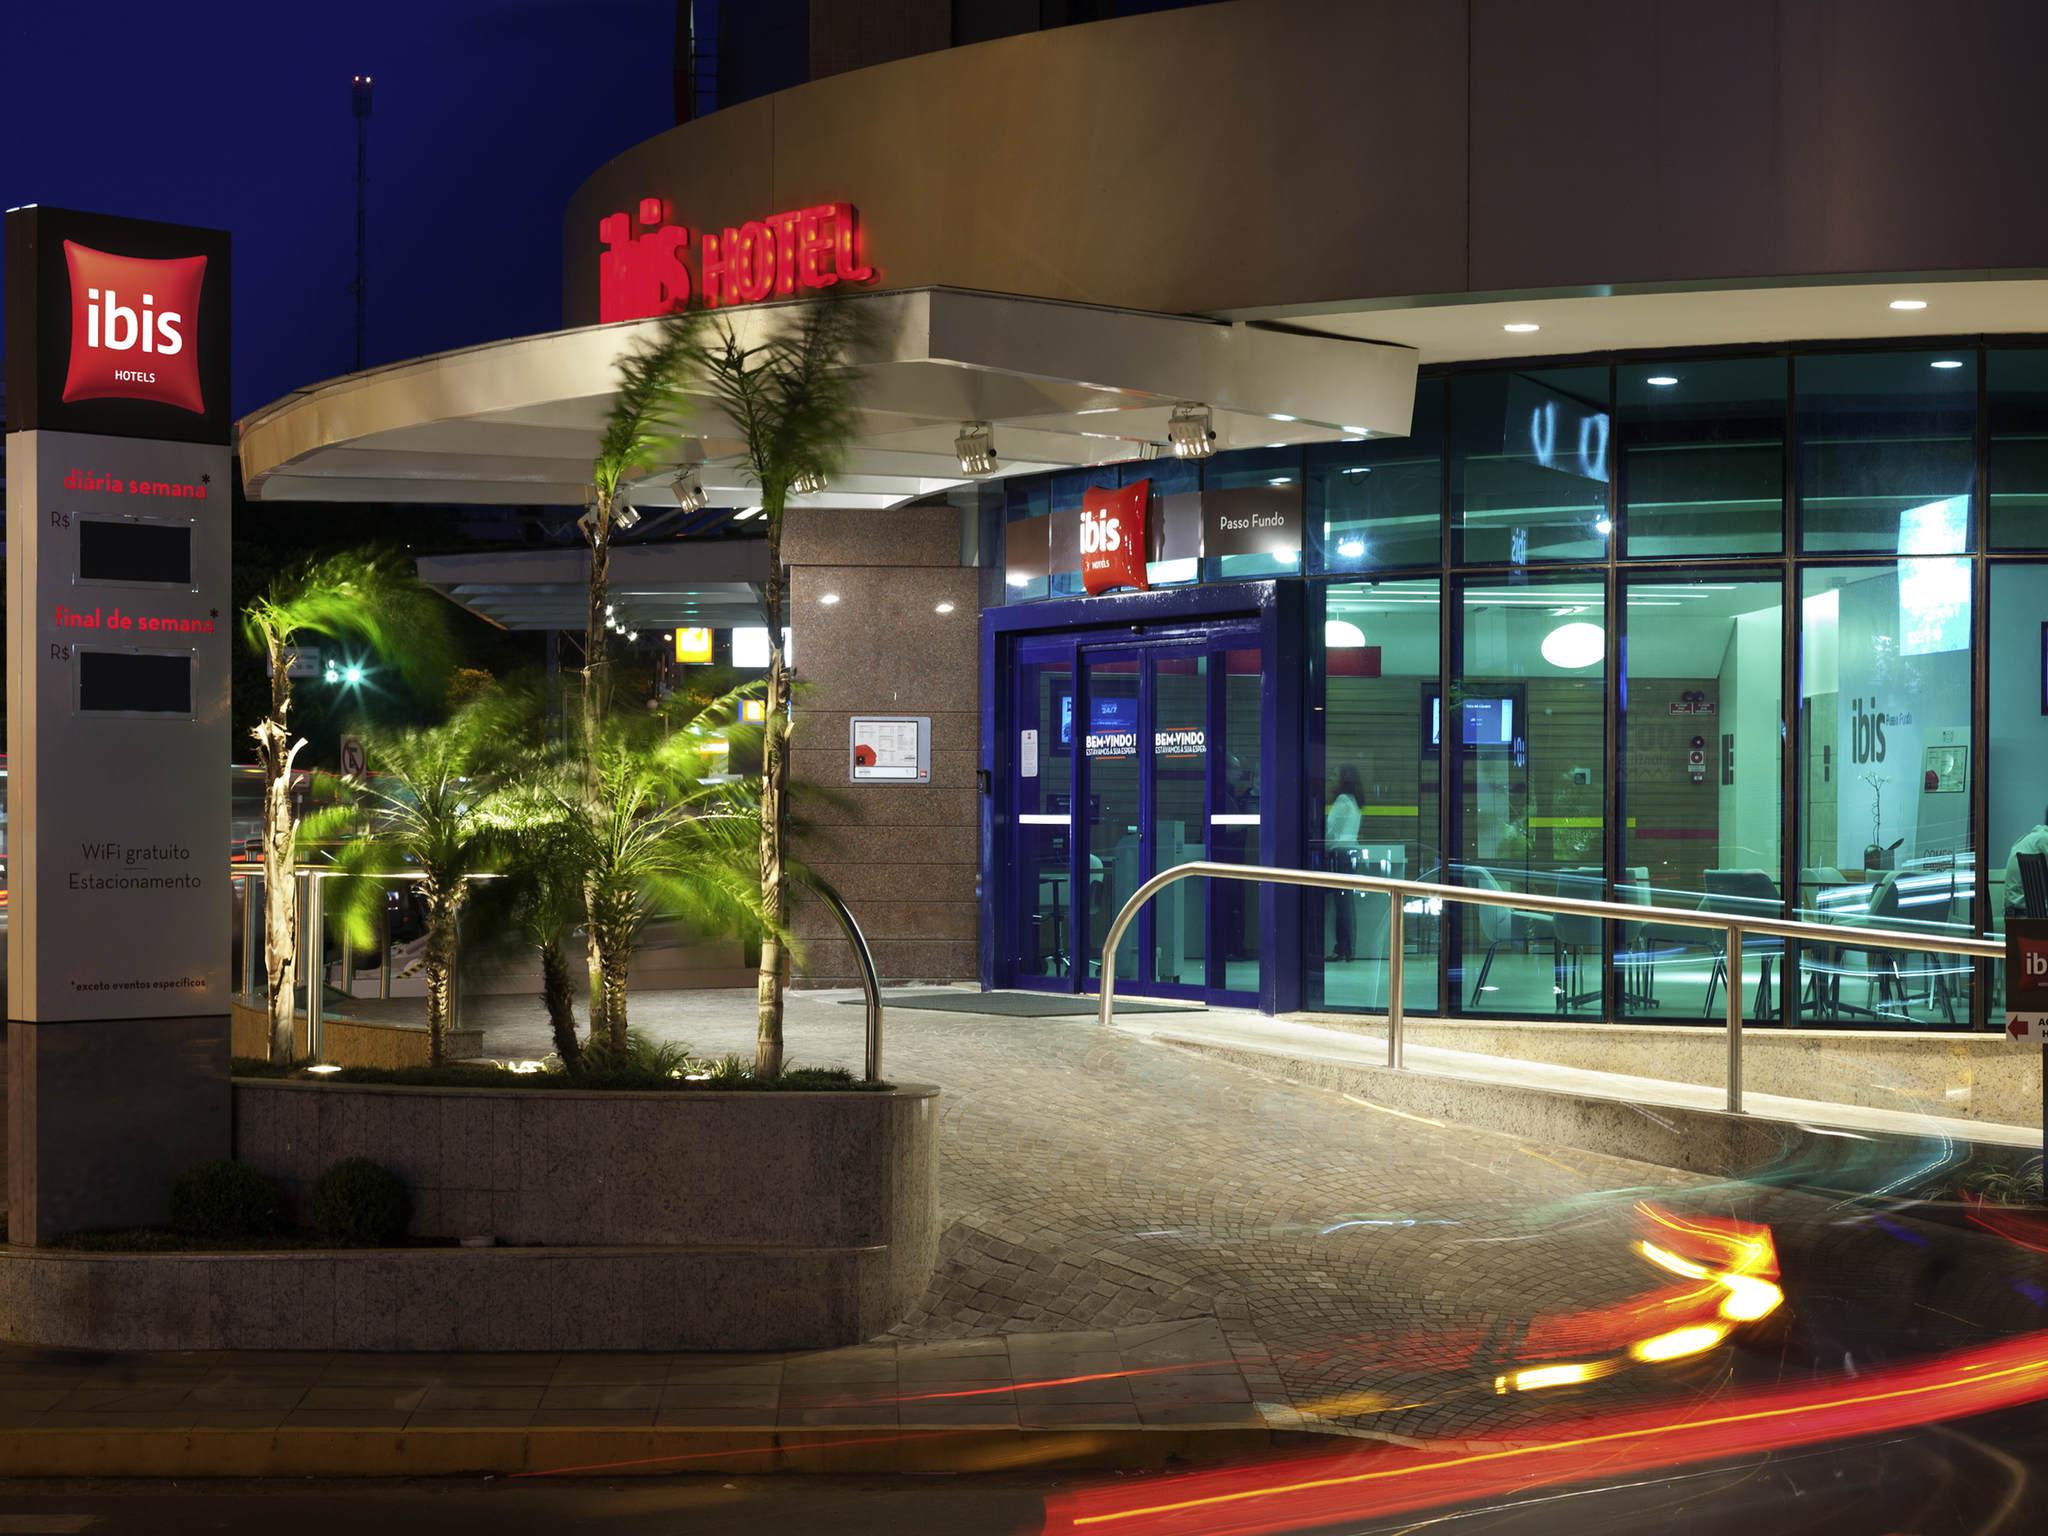 Hotel – ibis Passo Fundo Shopping